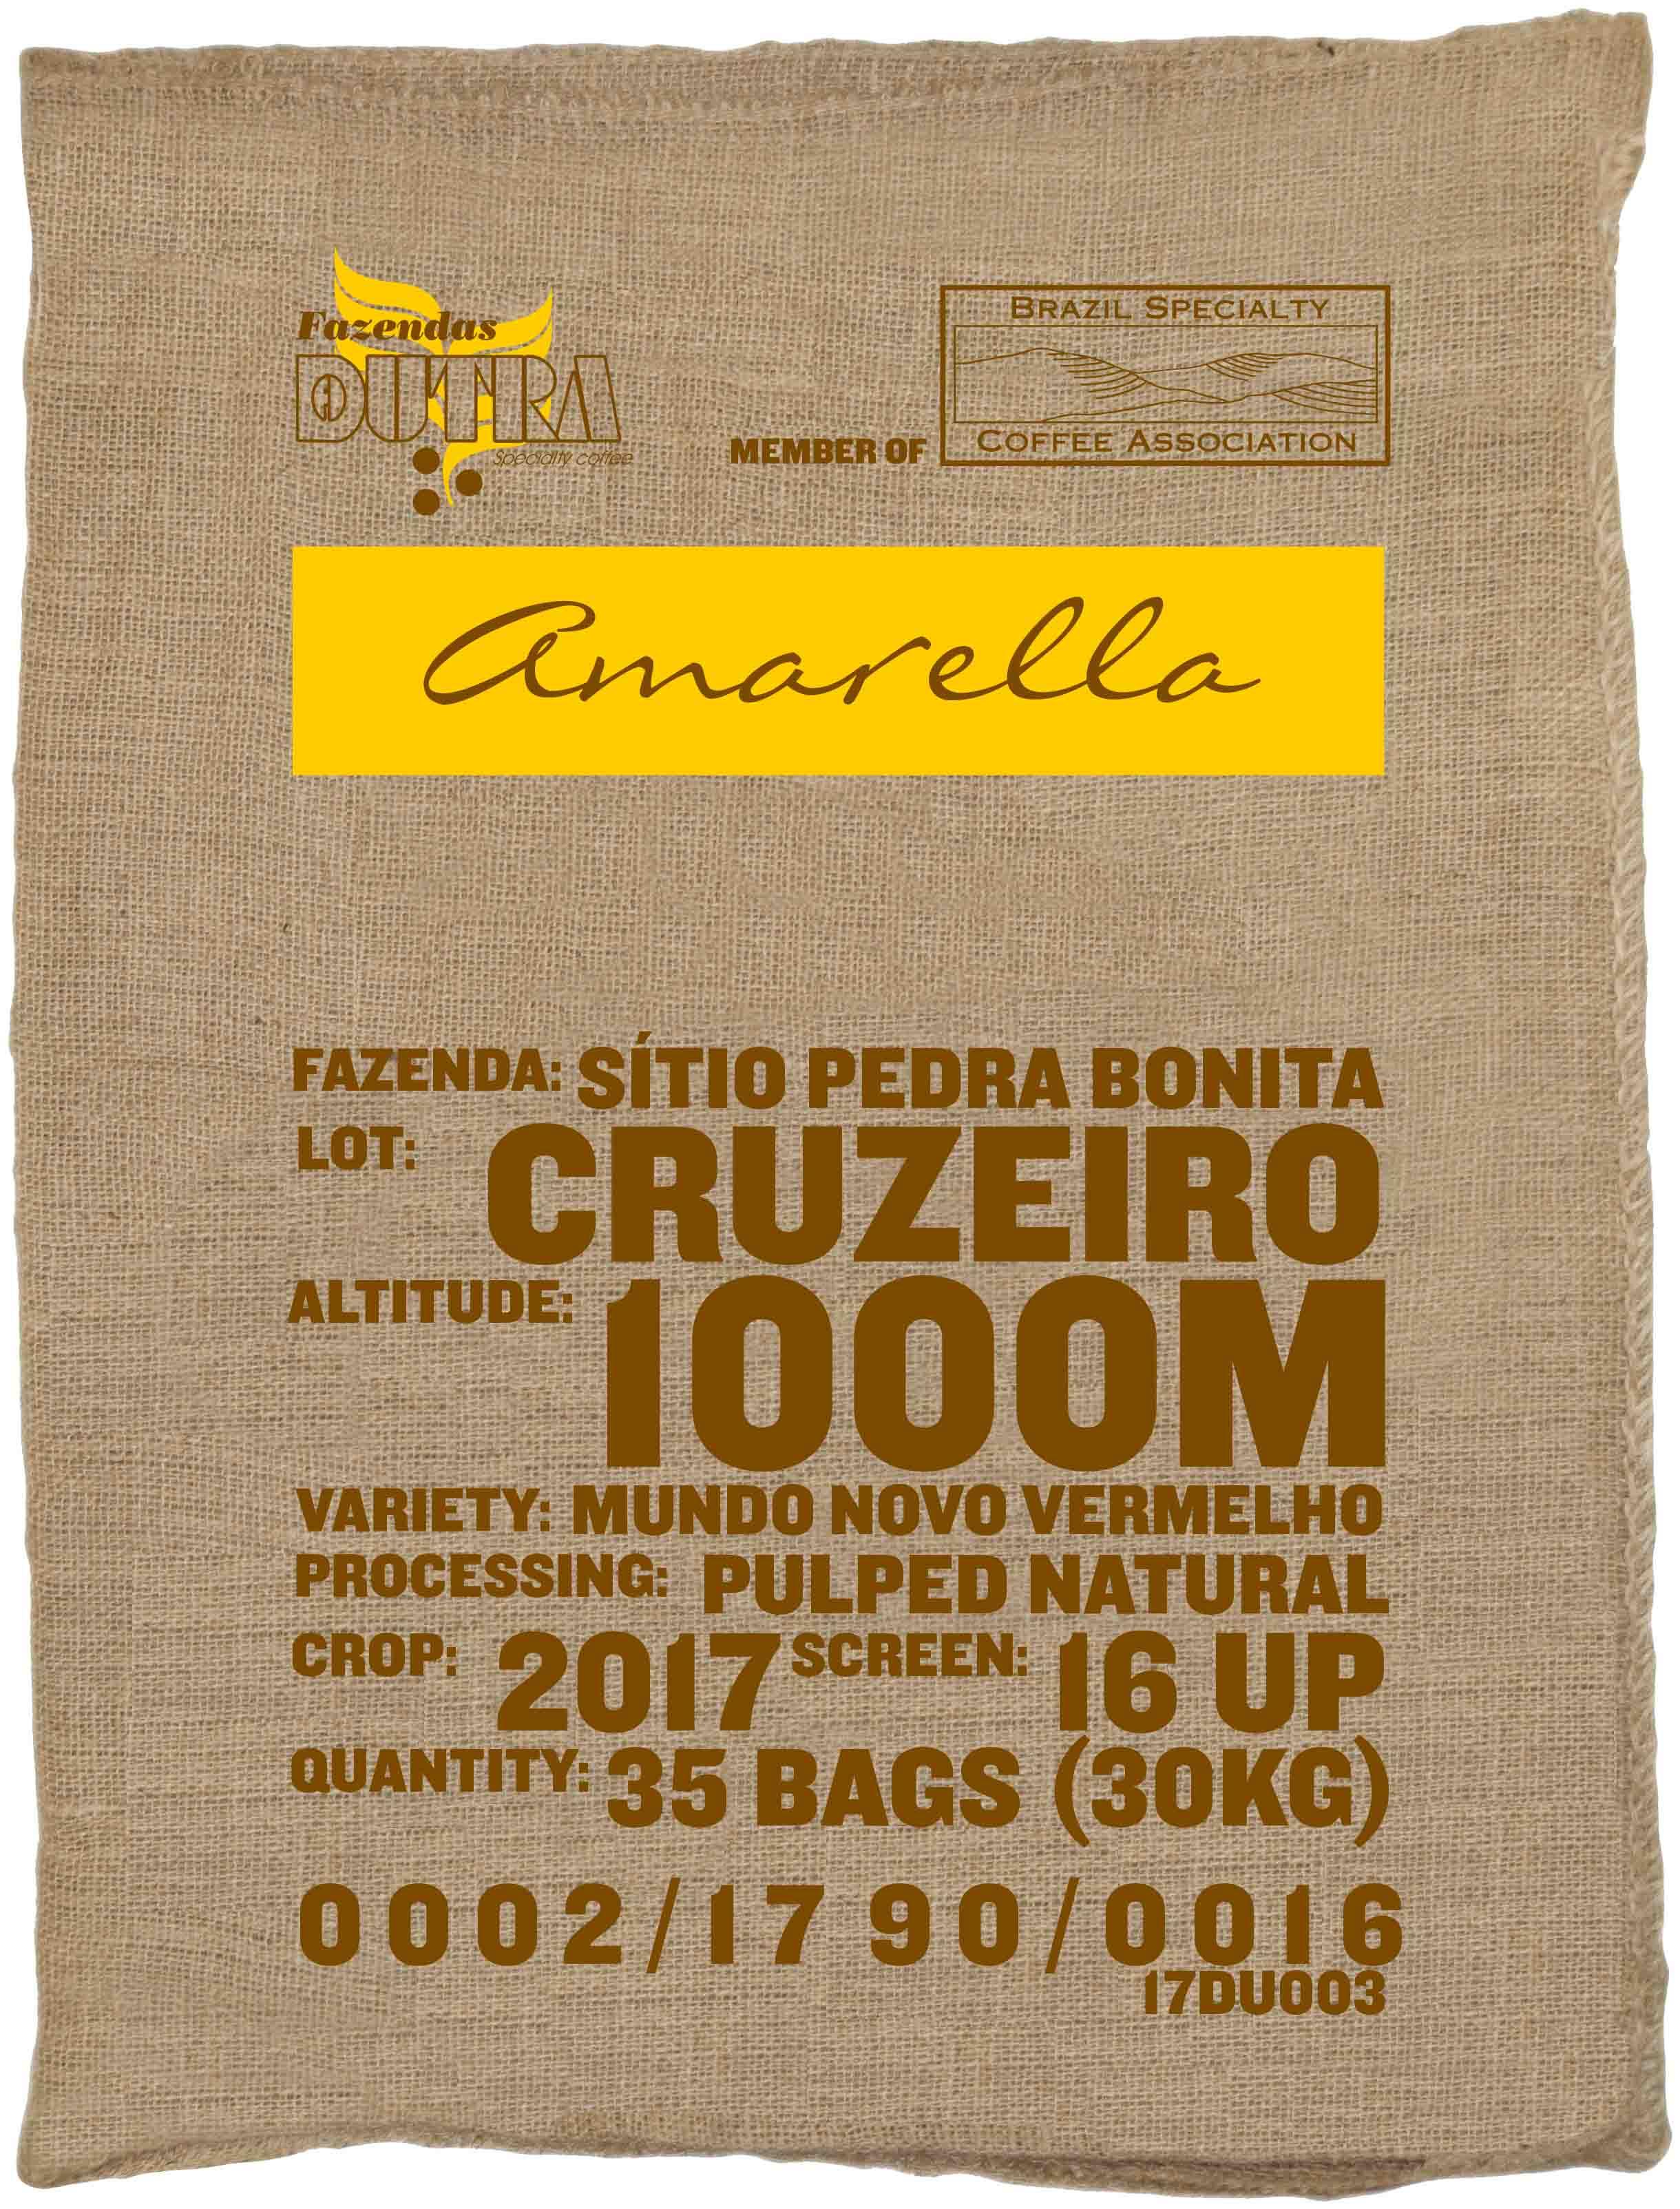 Ein Rohkaffeesack amarella Parzellenkaffee Varietät Mundo Novo vermelho. Fazendas Dutra Lot Cruzeiro.